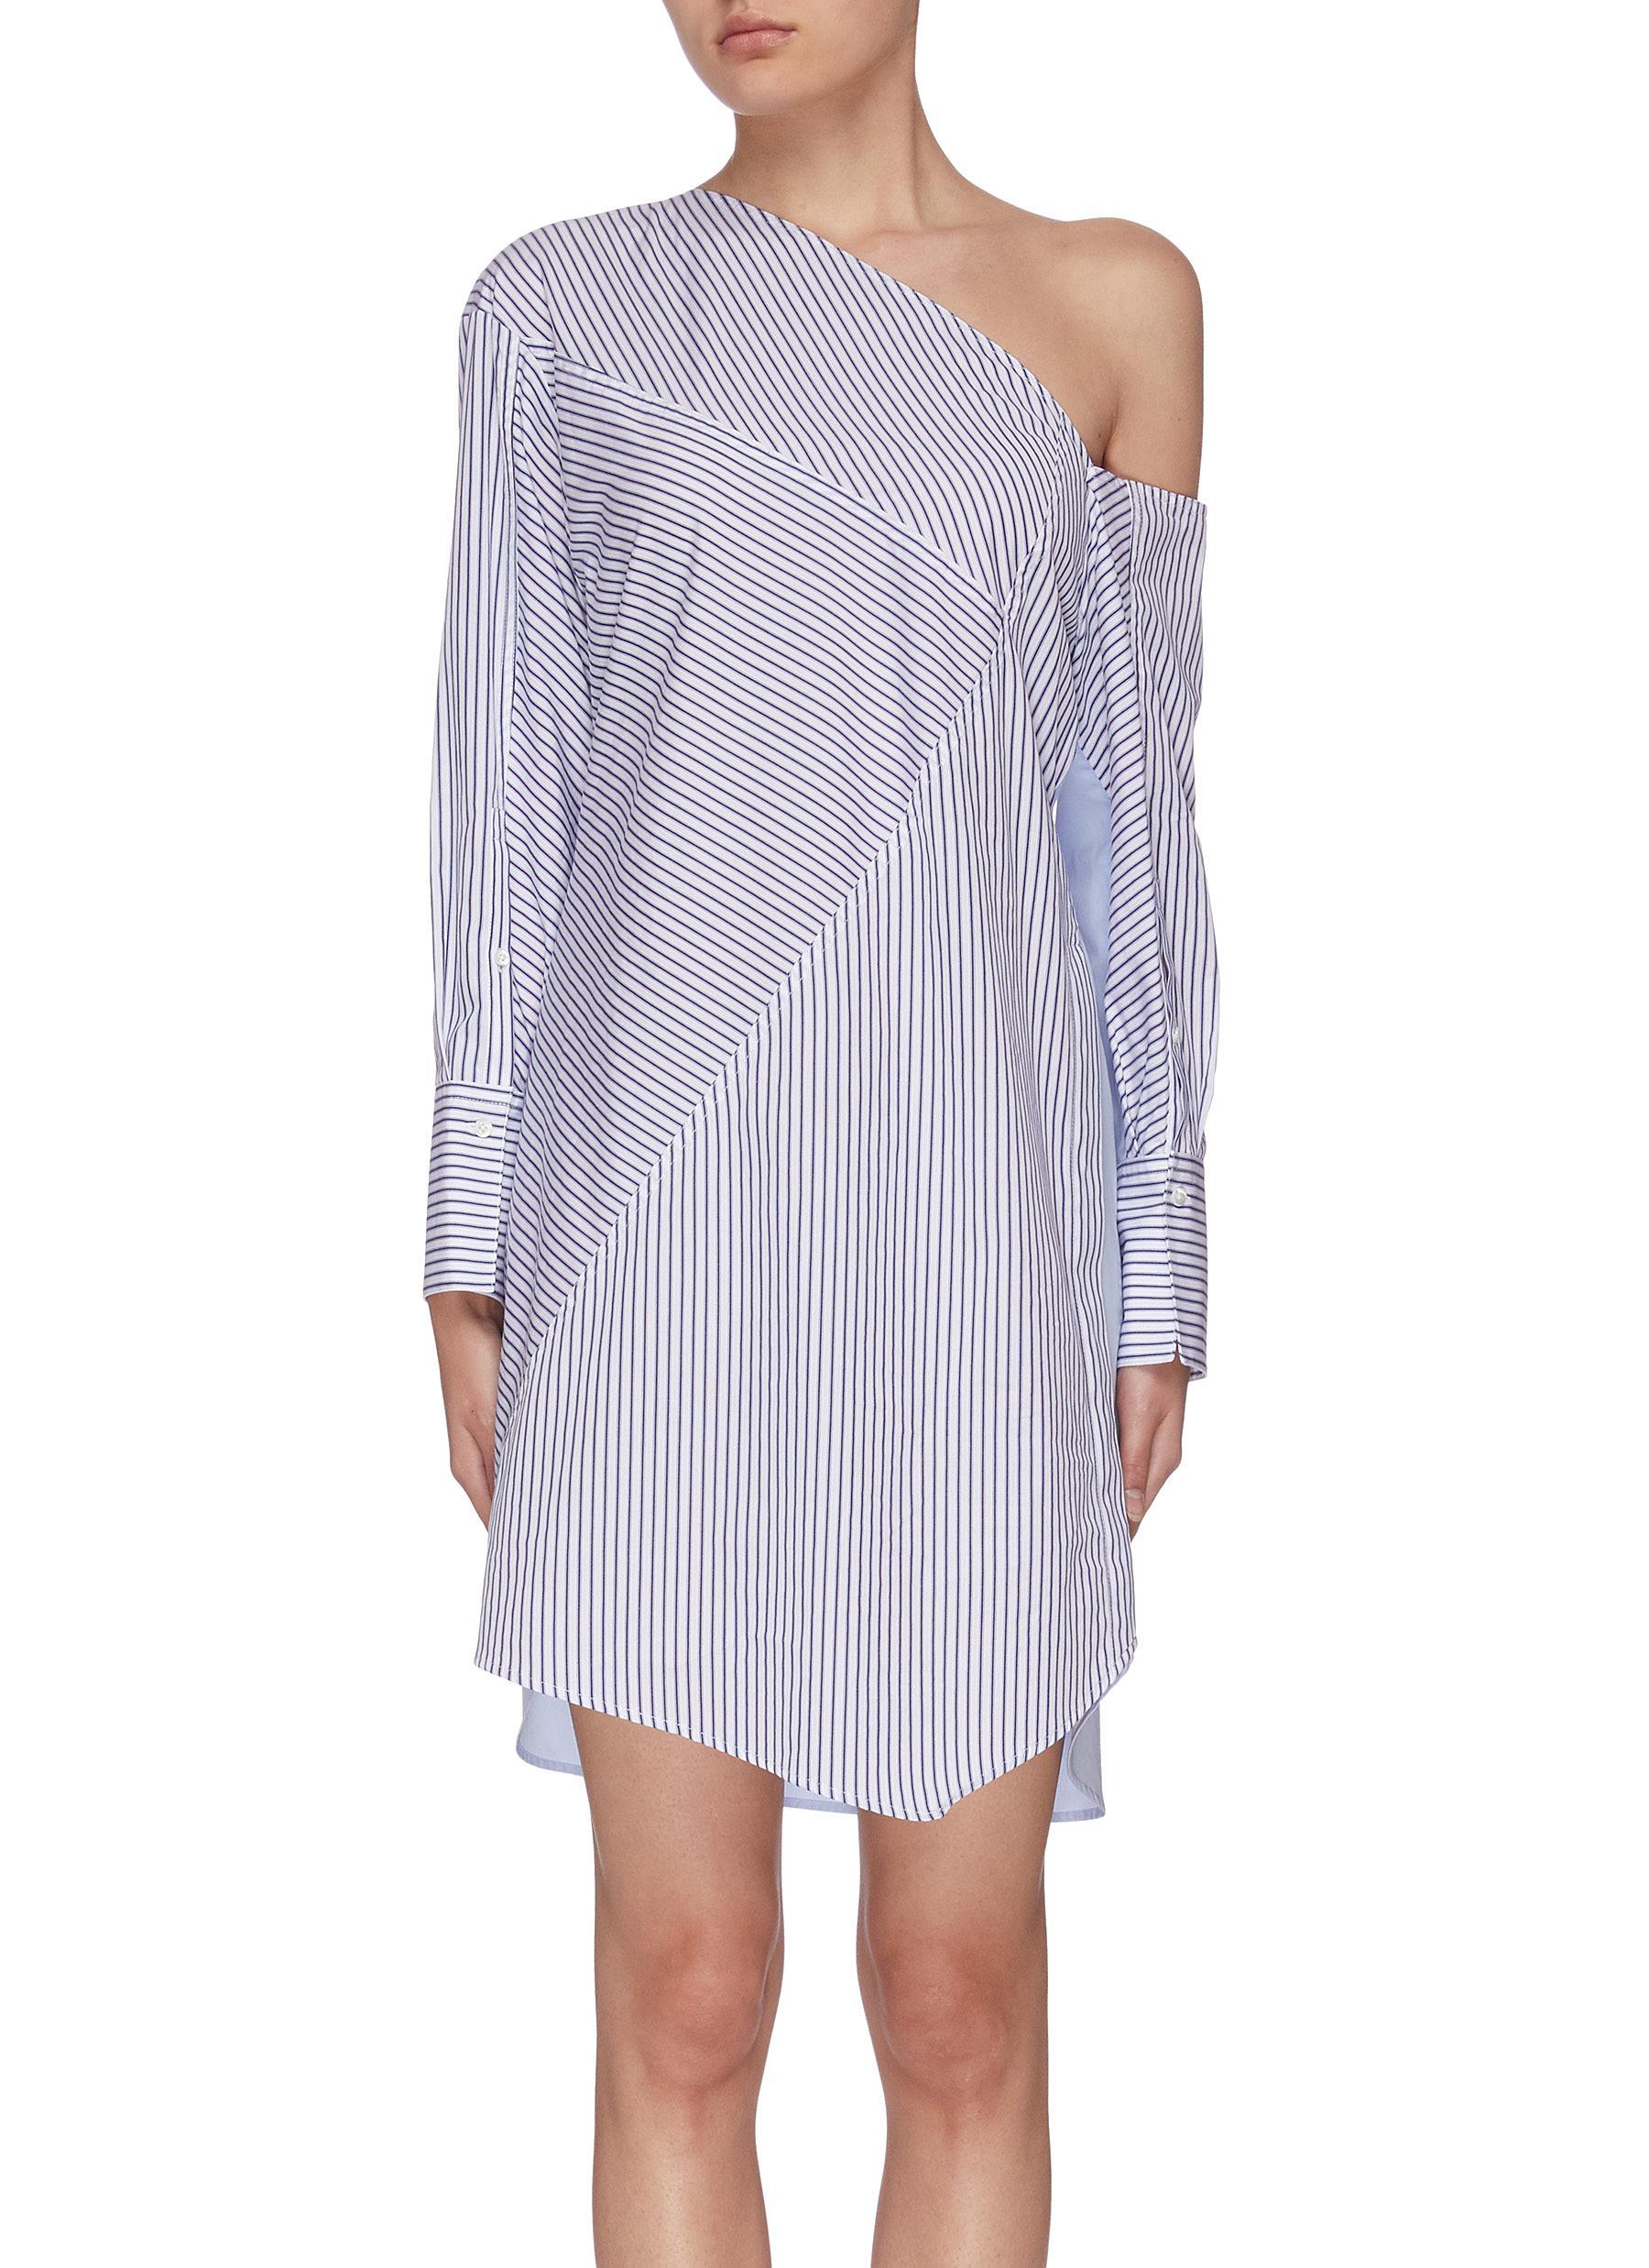 shop 3.1 Phillip Lim Contrast panel stripe one should shirt dress online